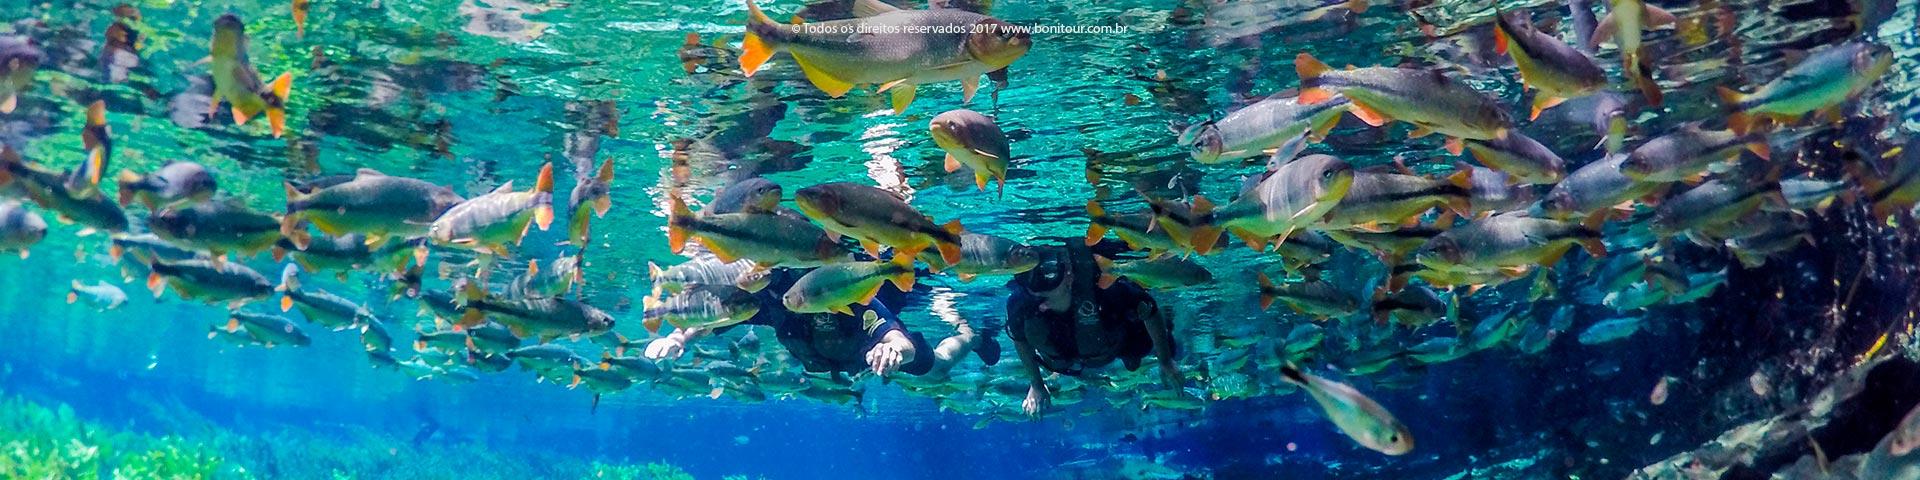 Aquario-natural-flutuacao-Bonitour-Passeios-em-Bonito-MS-956_2330.jpg